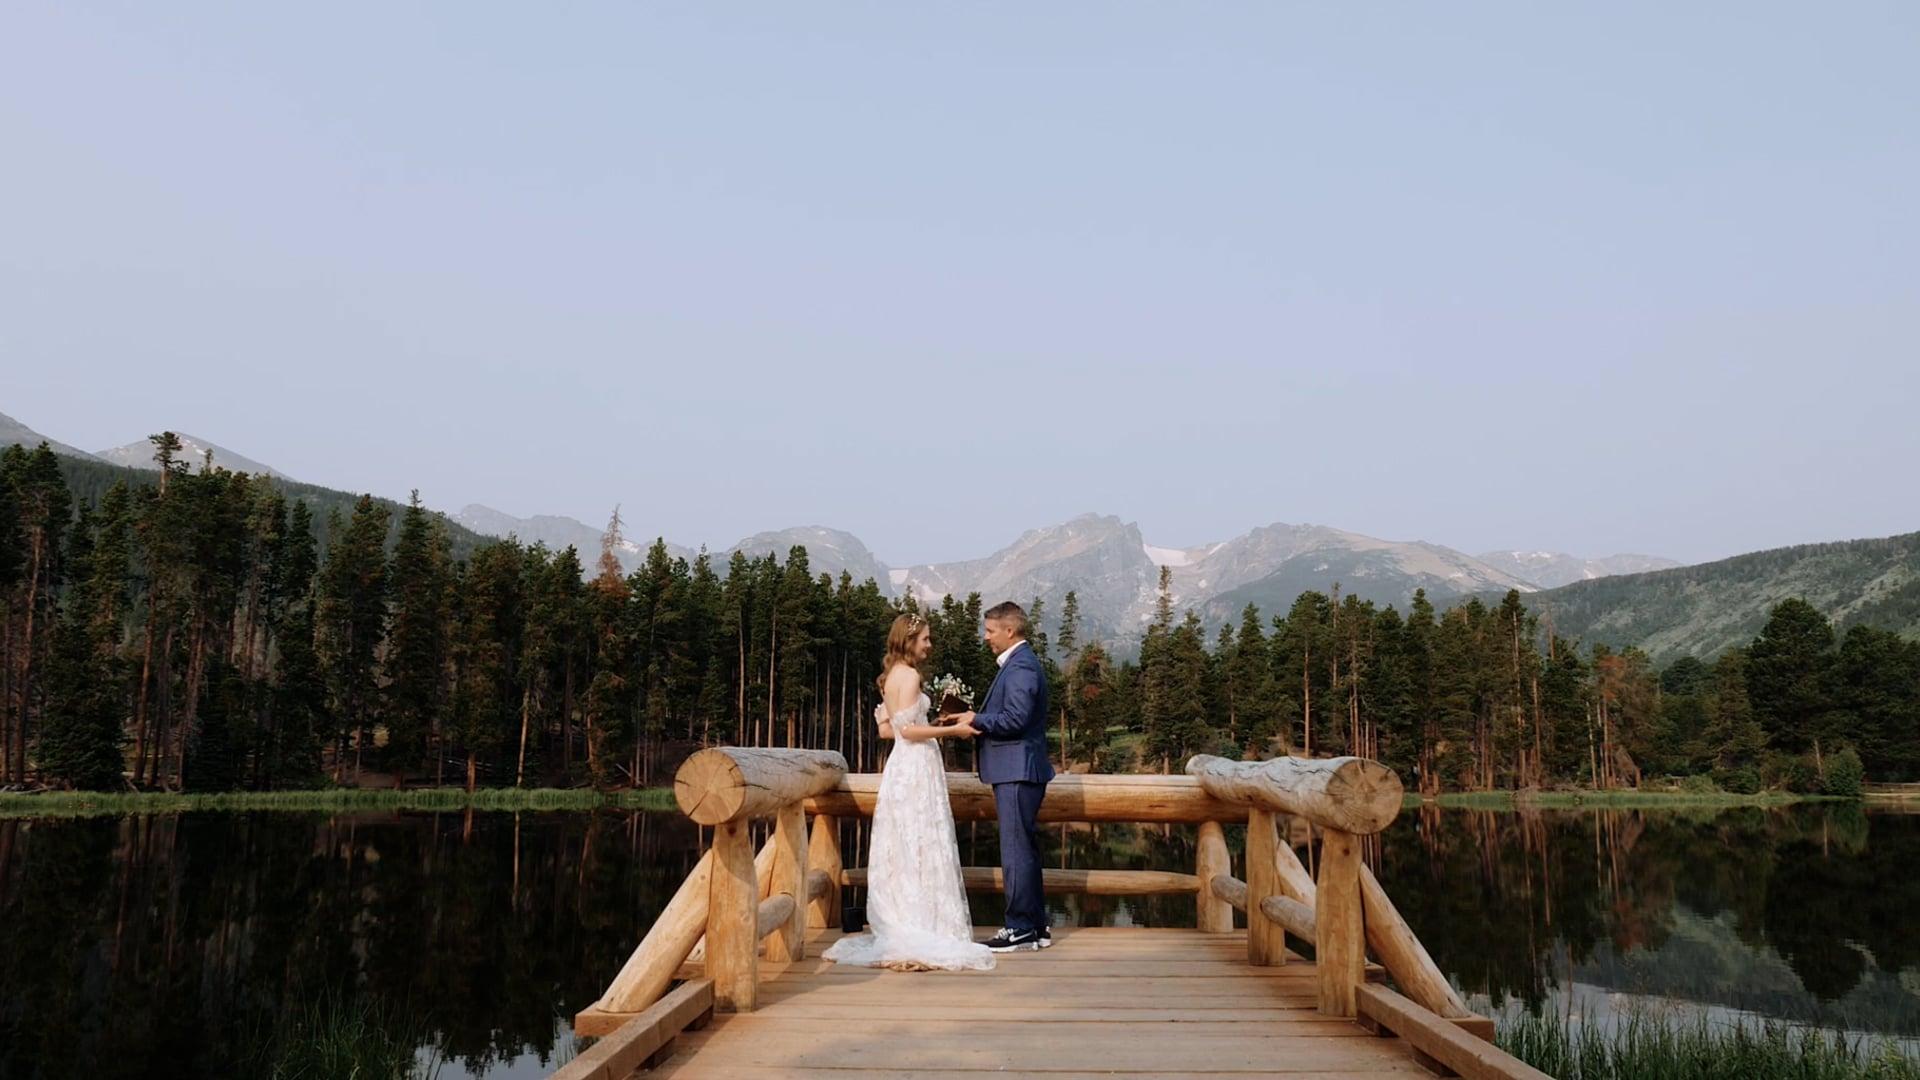 Sprague Lake Sunrise Elopement Ceremony - Lauren & Johan